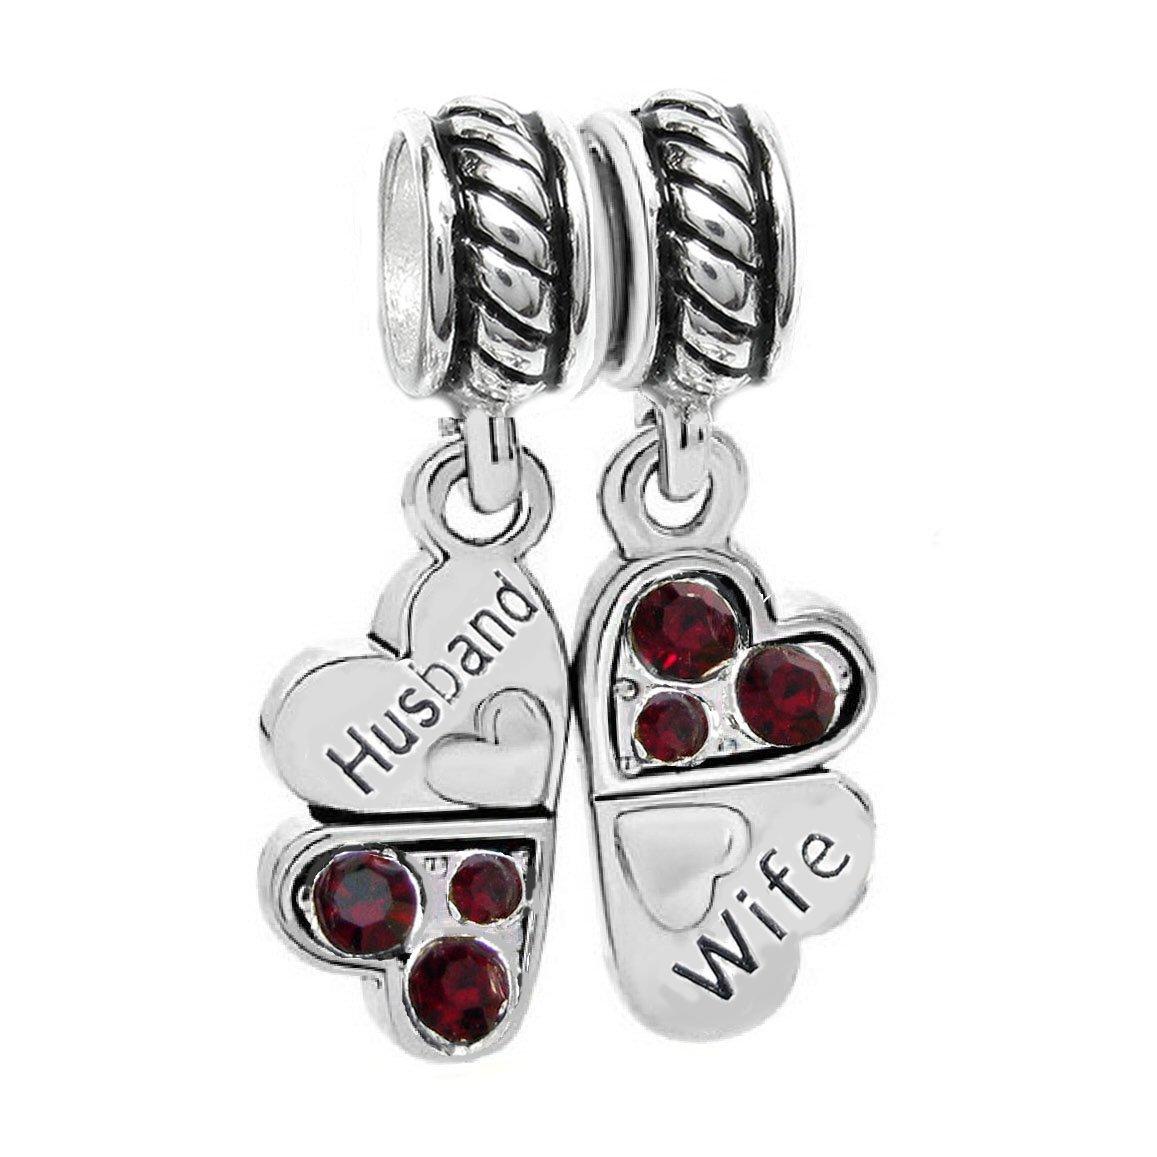 Sterling Silver Rhinestone 'Husband Wife Love' Heart European Bead Charm